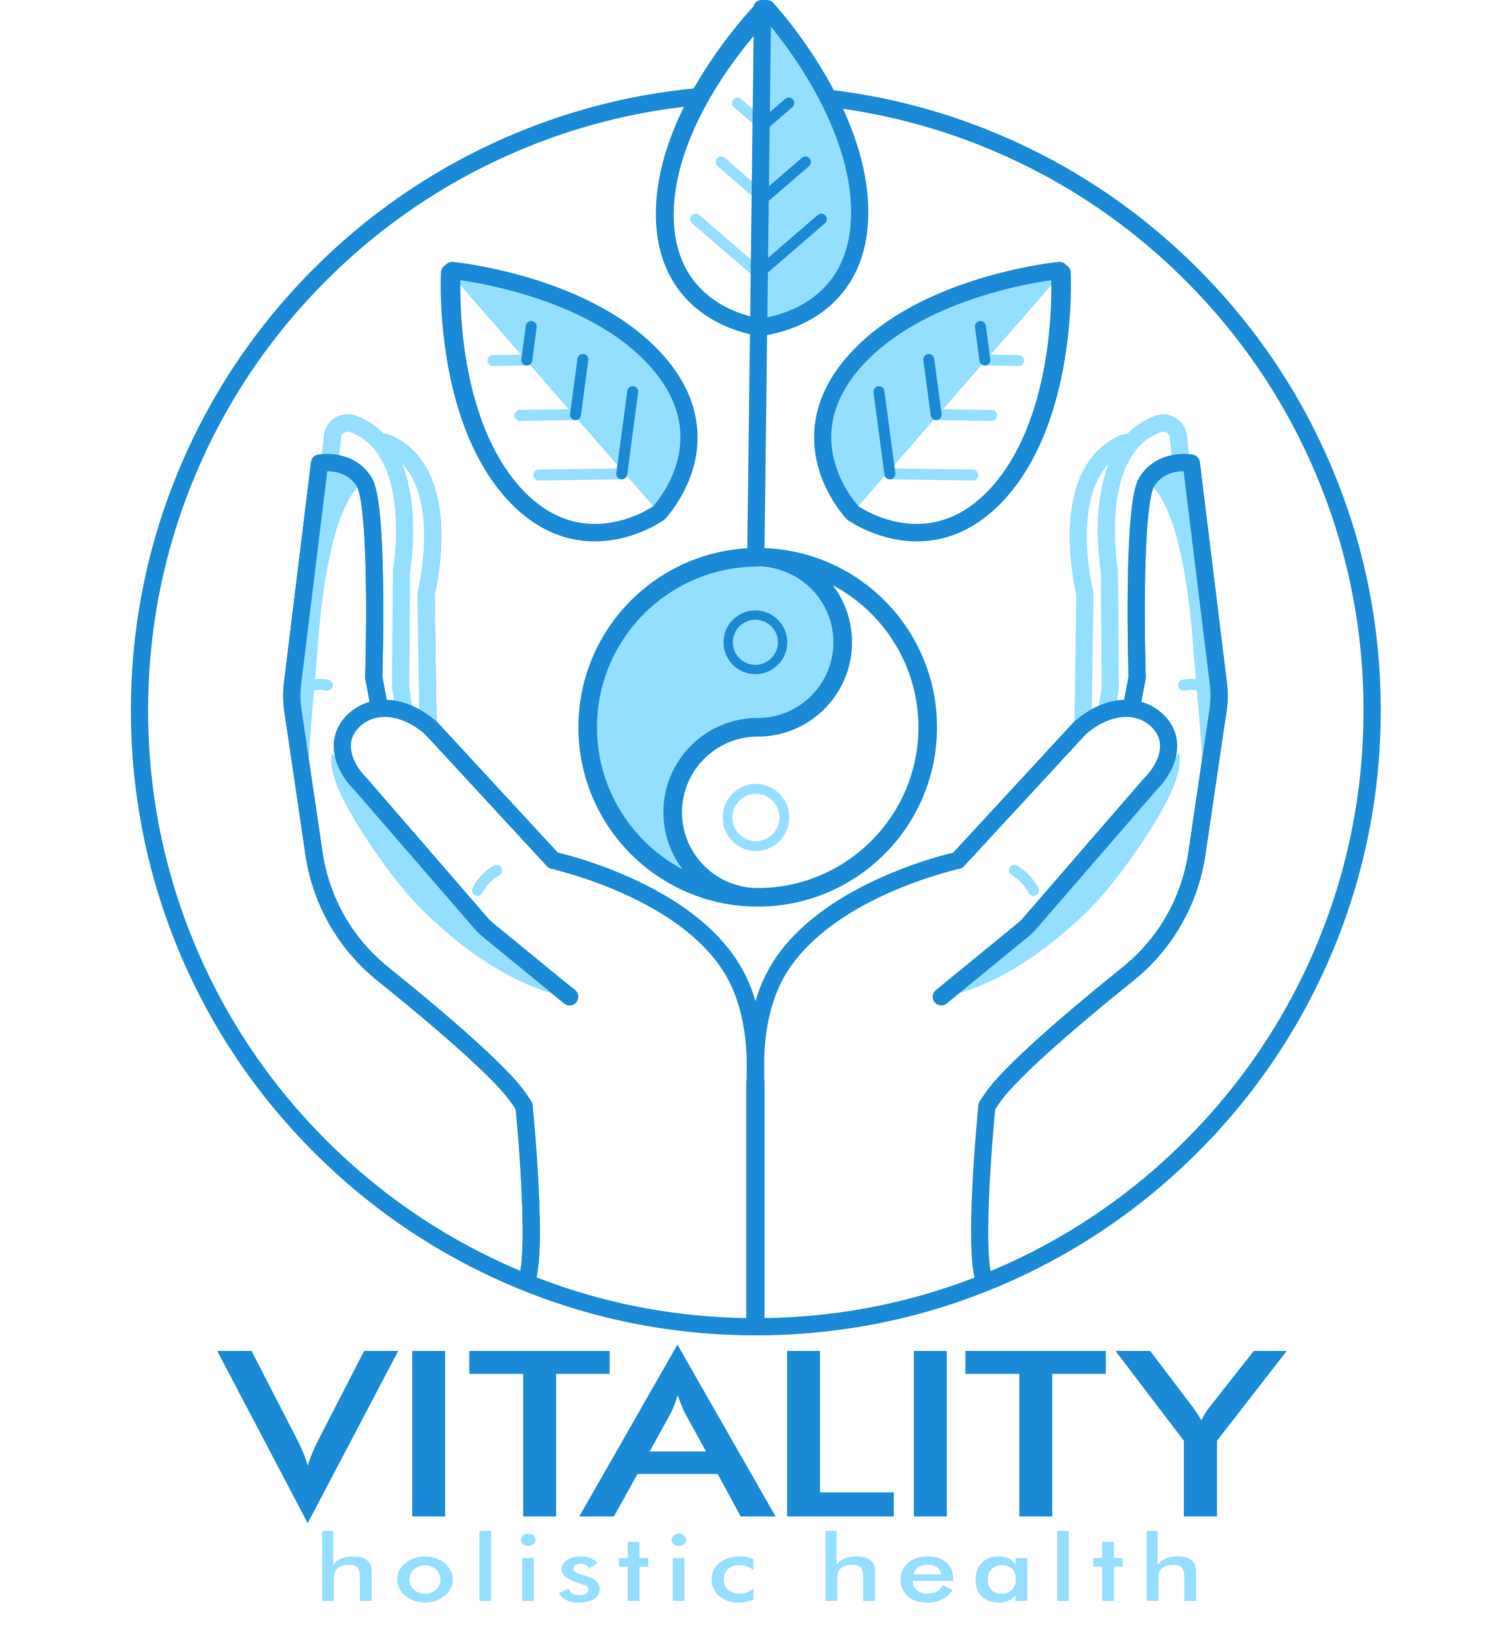 Vitality Holistic Health